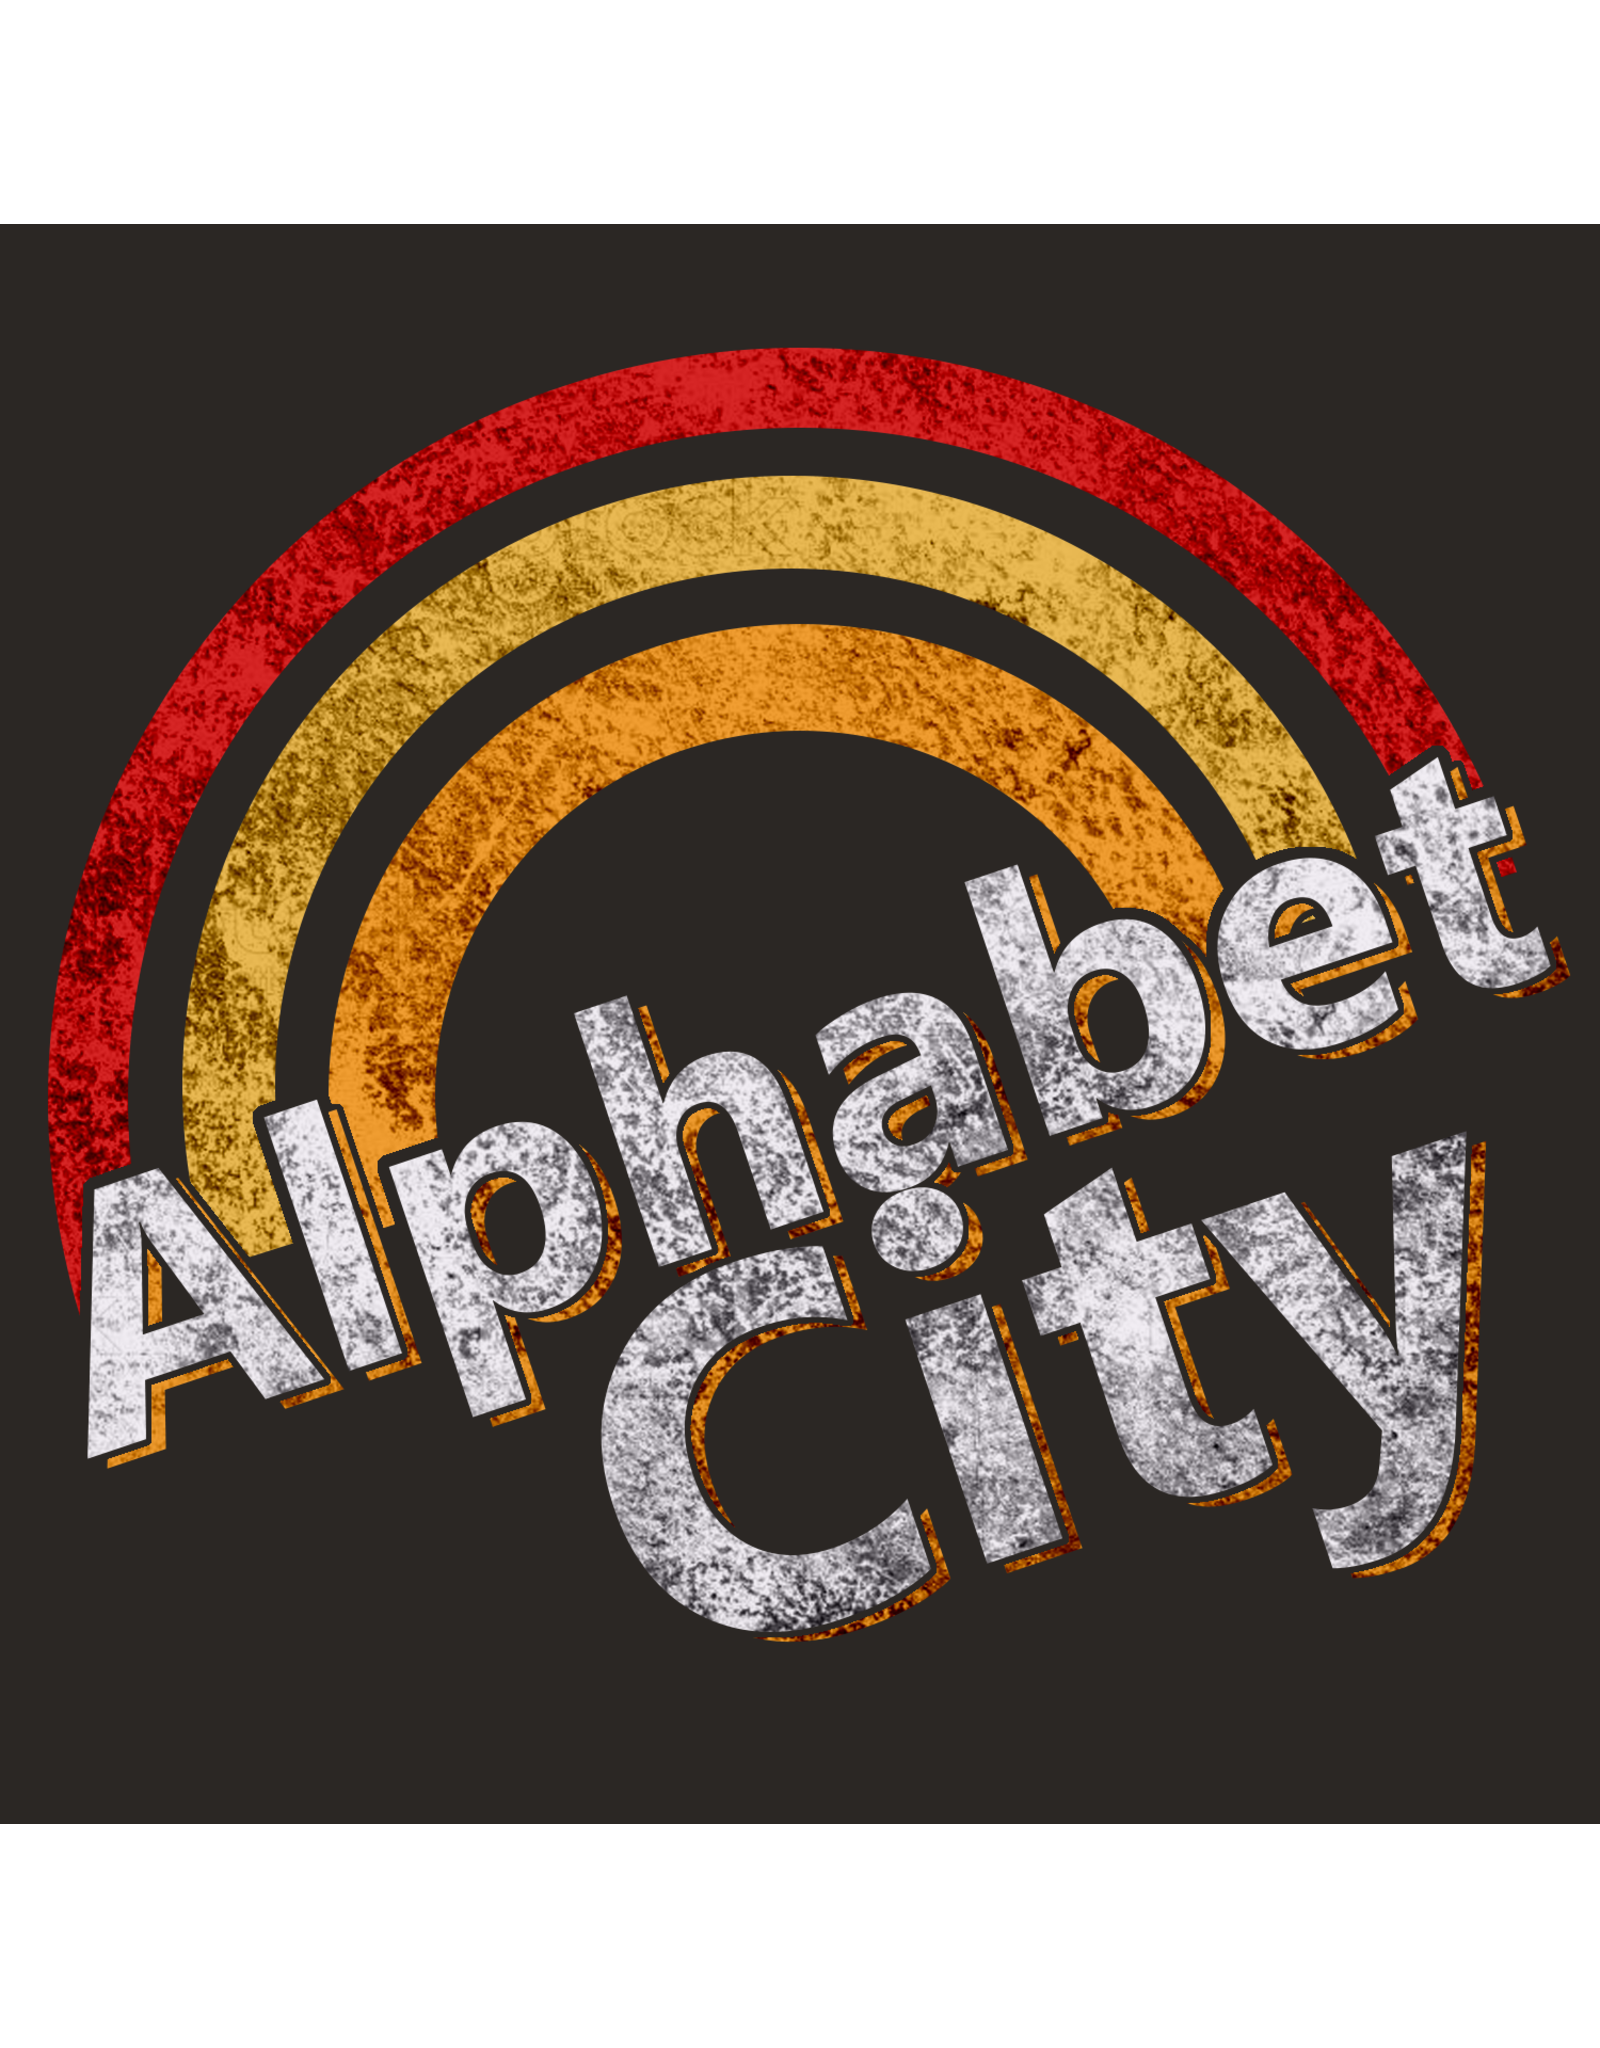 The Brooklyn Press Alphabet City T-shirt